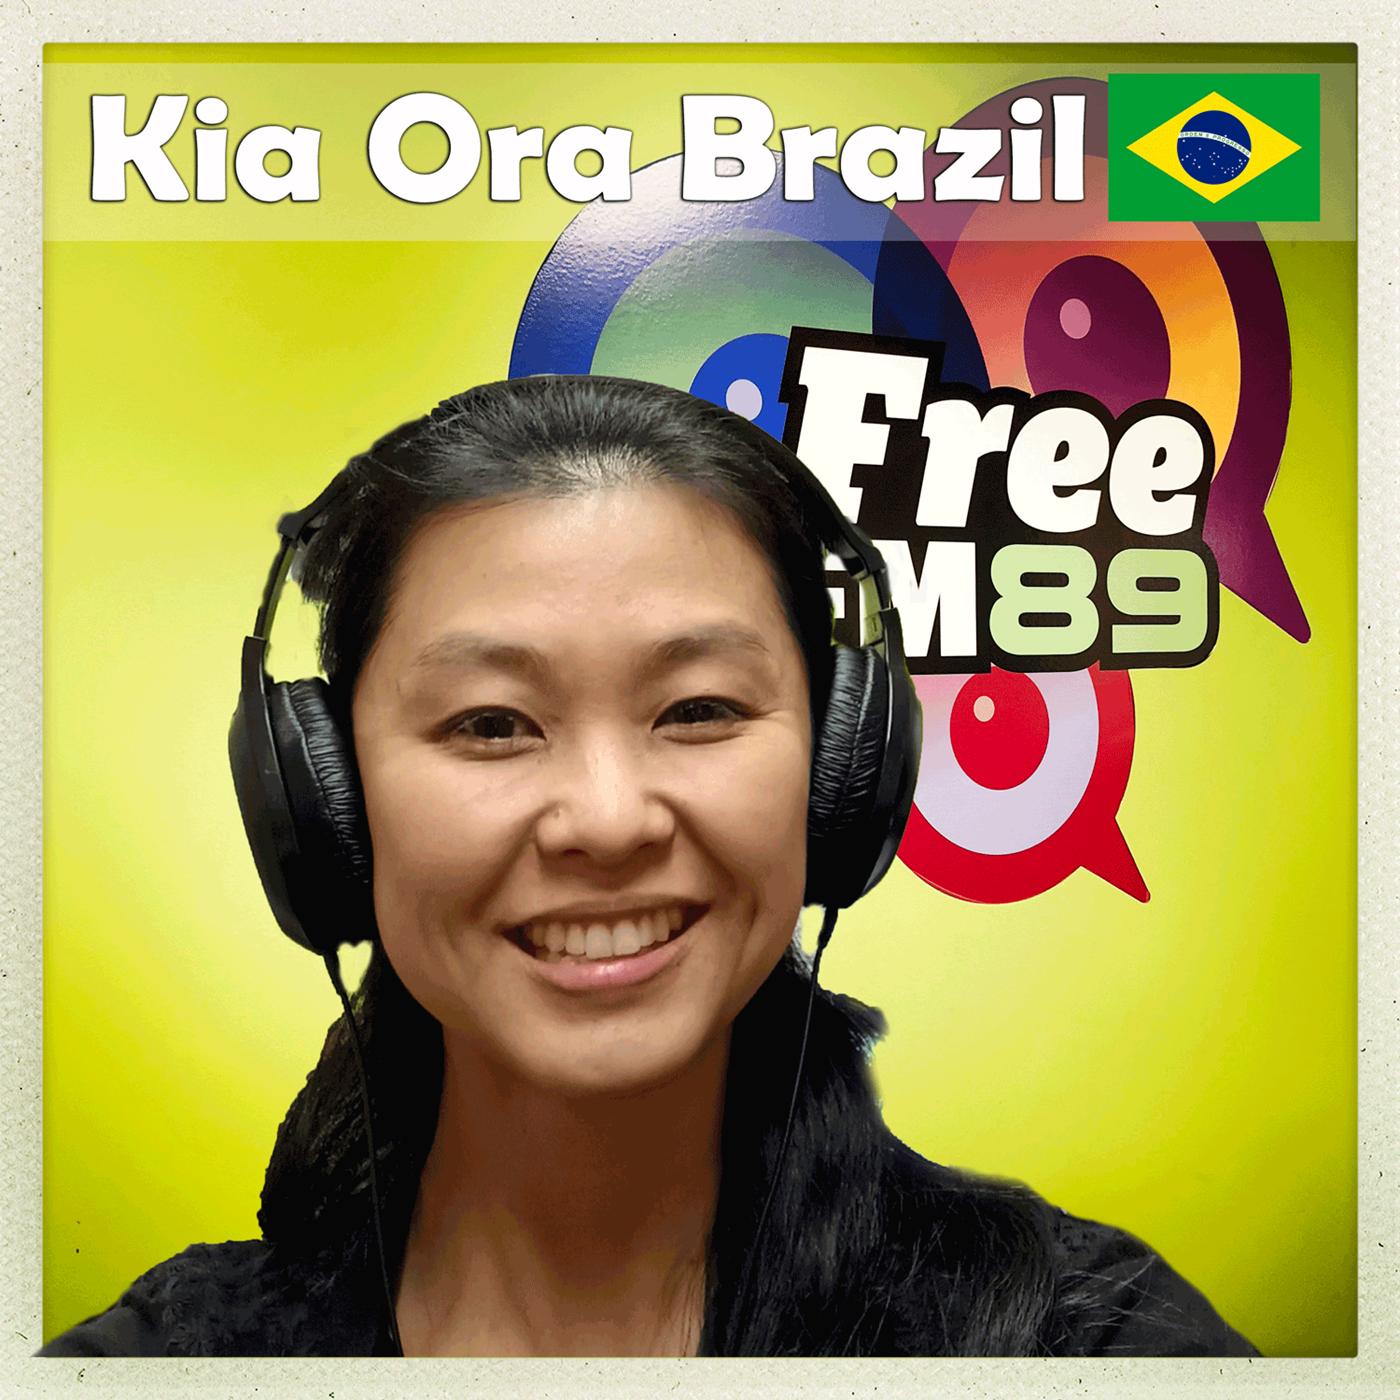 https://cdn.accessradio.org/StationFolder/freefm89/Images/Kia_Ora_Brazil2.png